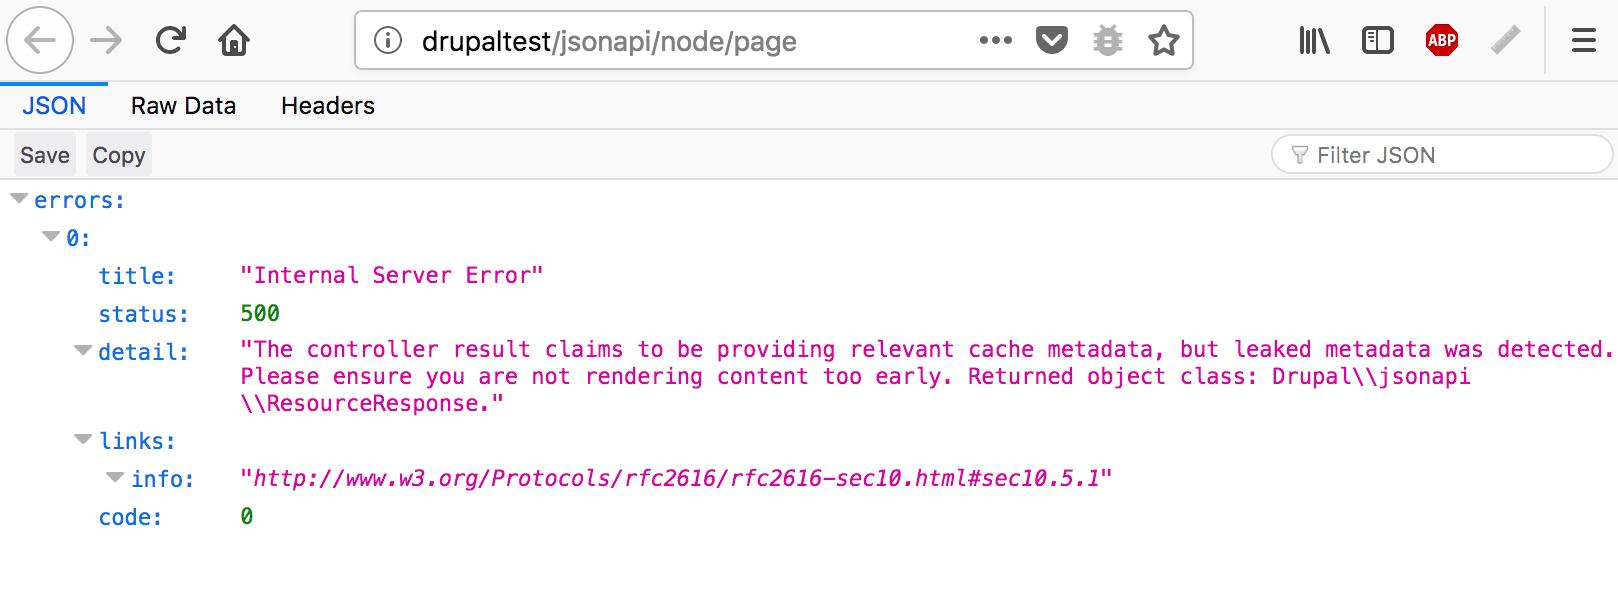 Access Denied 404 instead of Internal Server Error 500 [#2989316